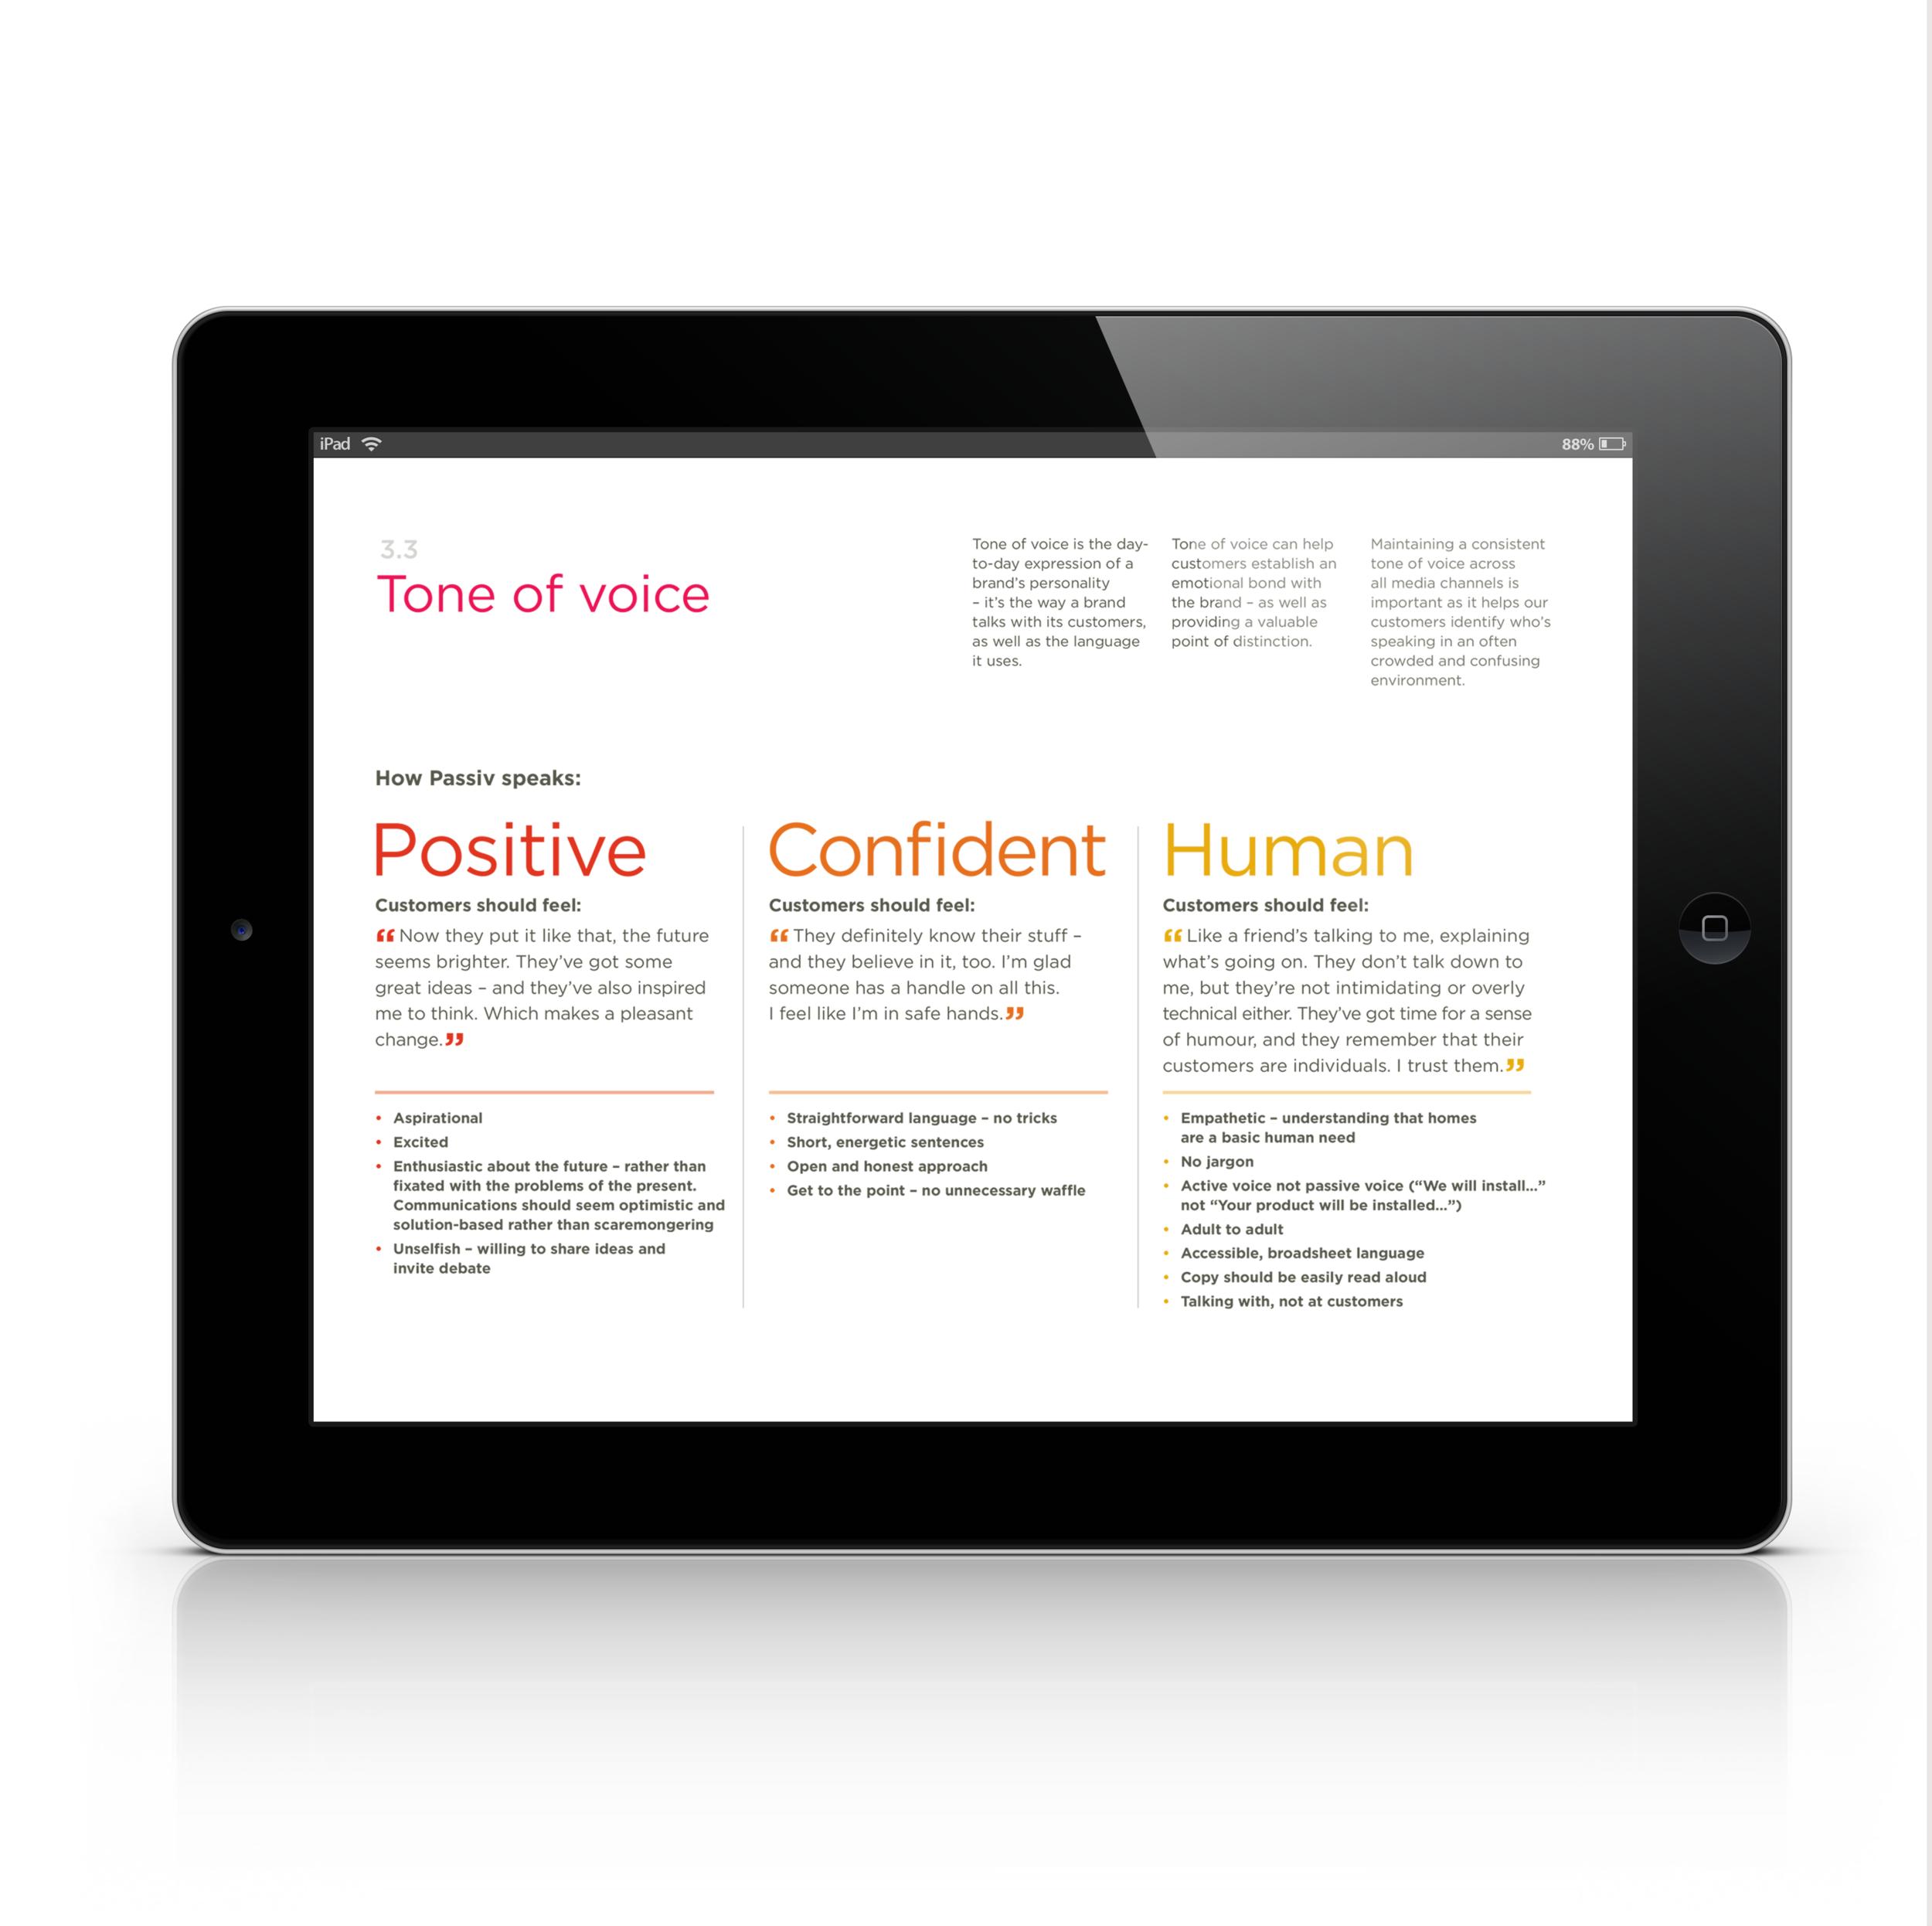 iPad-Landscape-Retina-Display-Mockup4.png